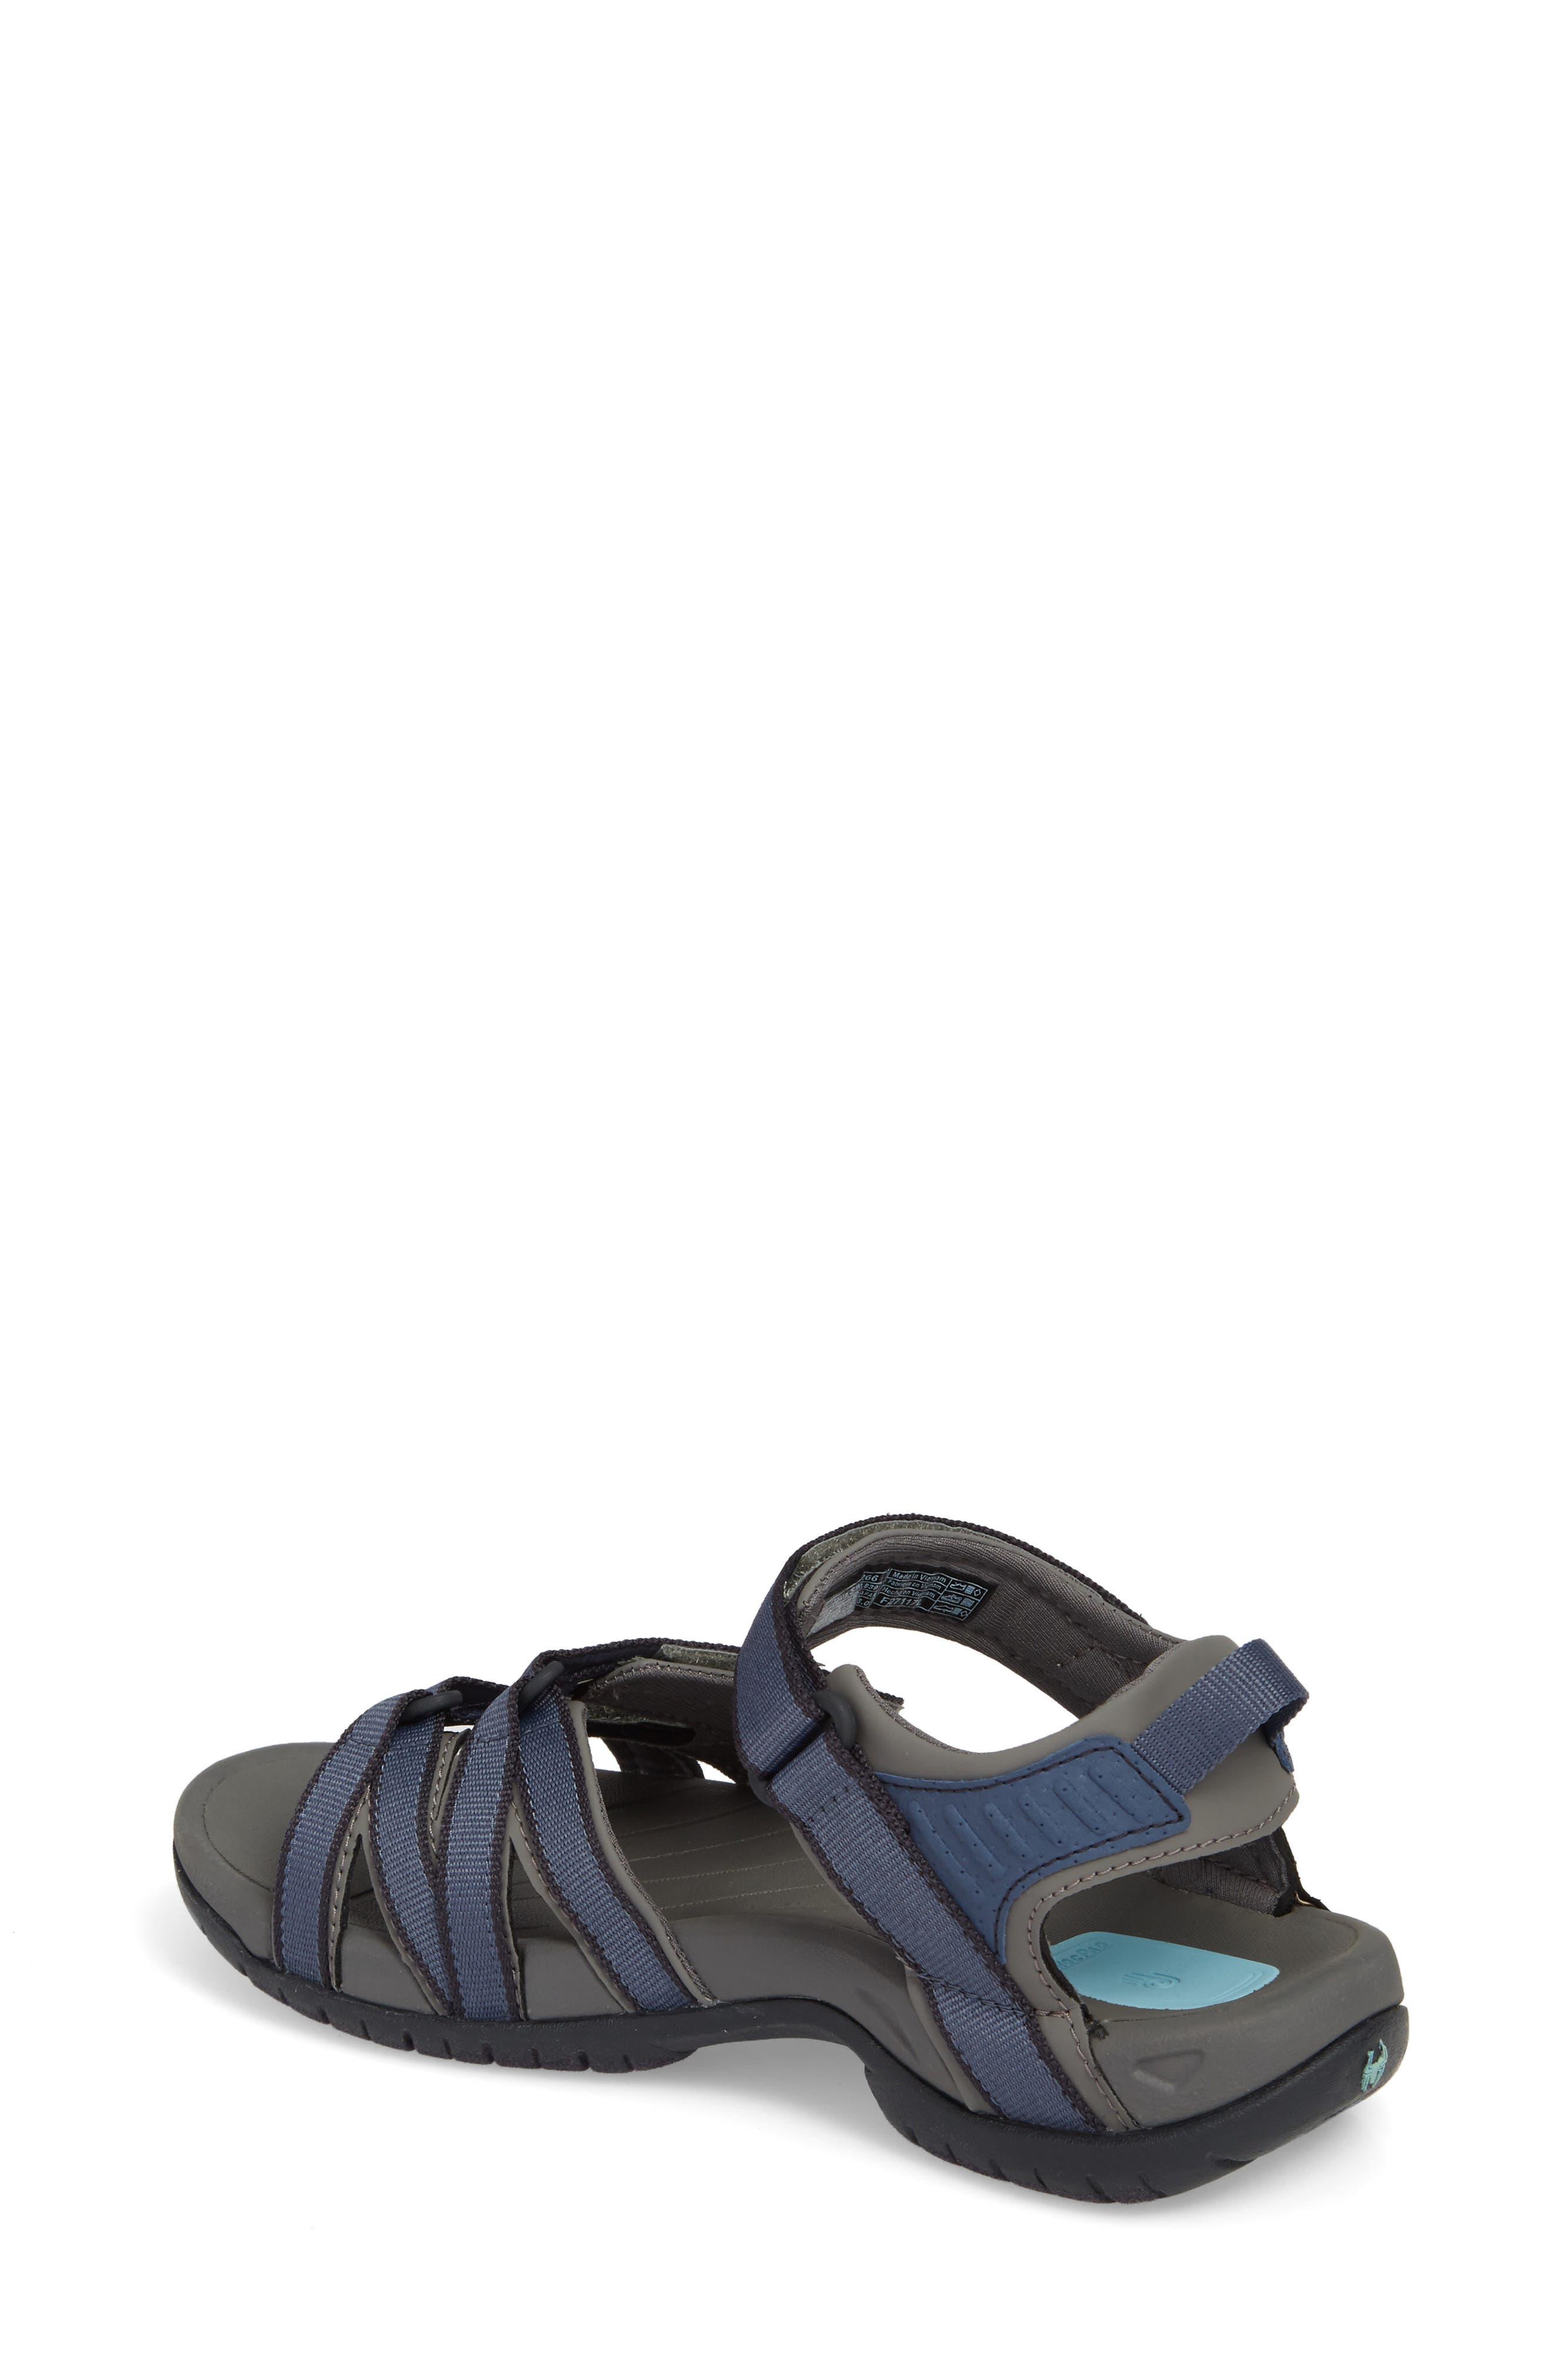 'Tirra' Sandal,                             Alternate thumbnail 2, color,                             BERING SEA